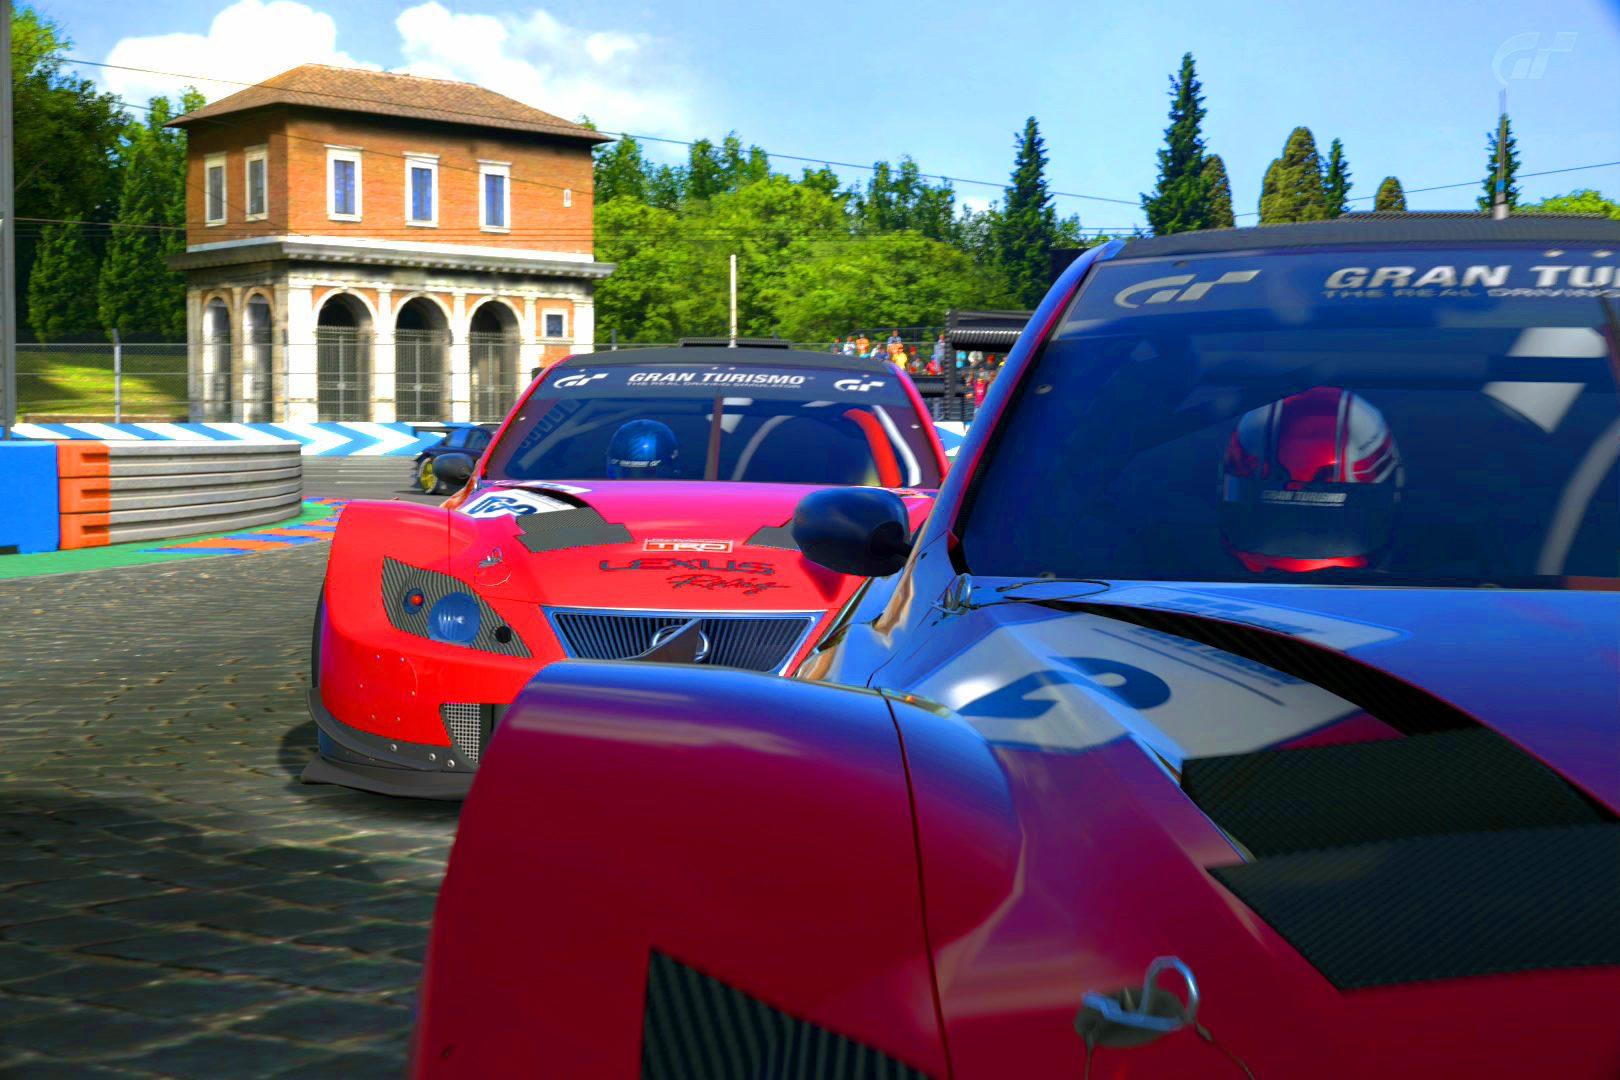 Circuito di Roma_67.jpg